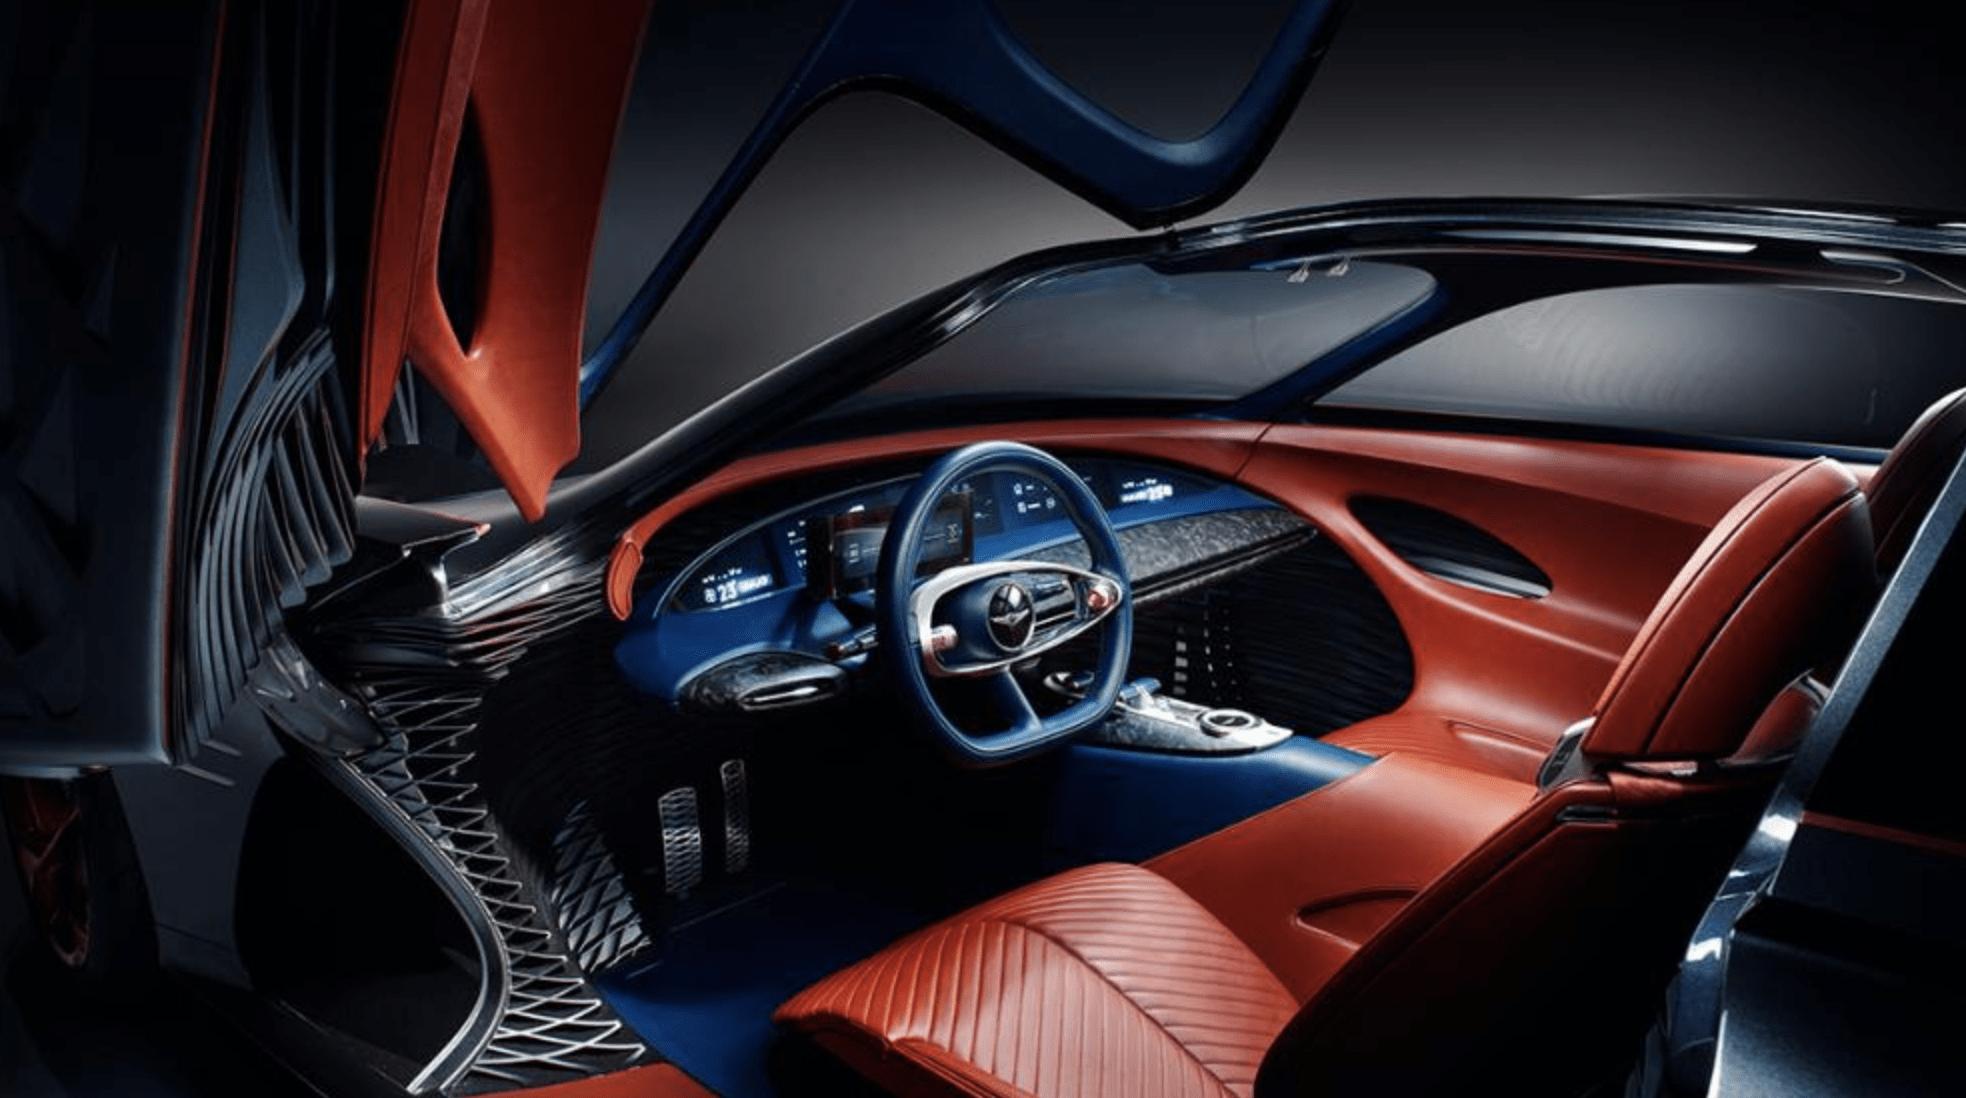 The Genesis Essentia Concept is the automotive future we